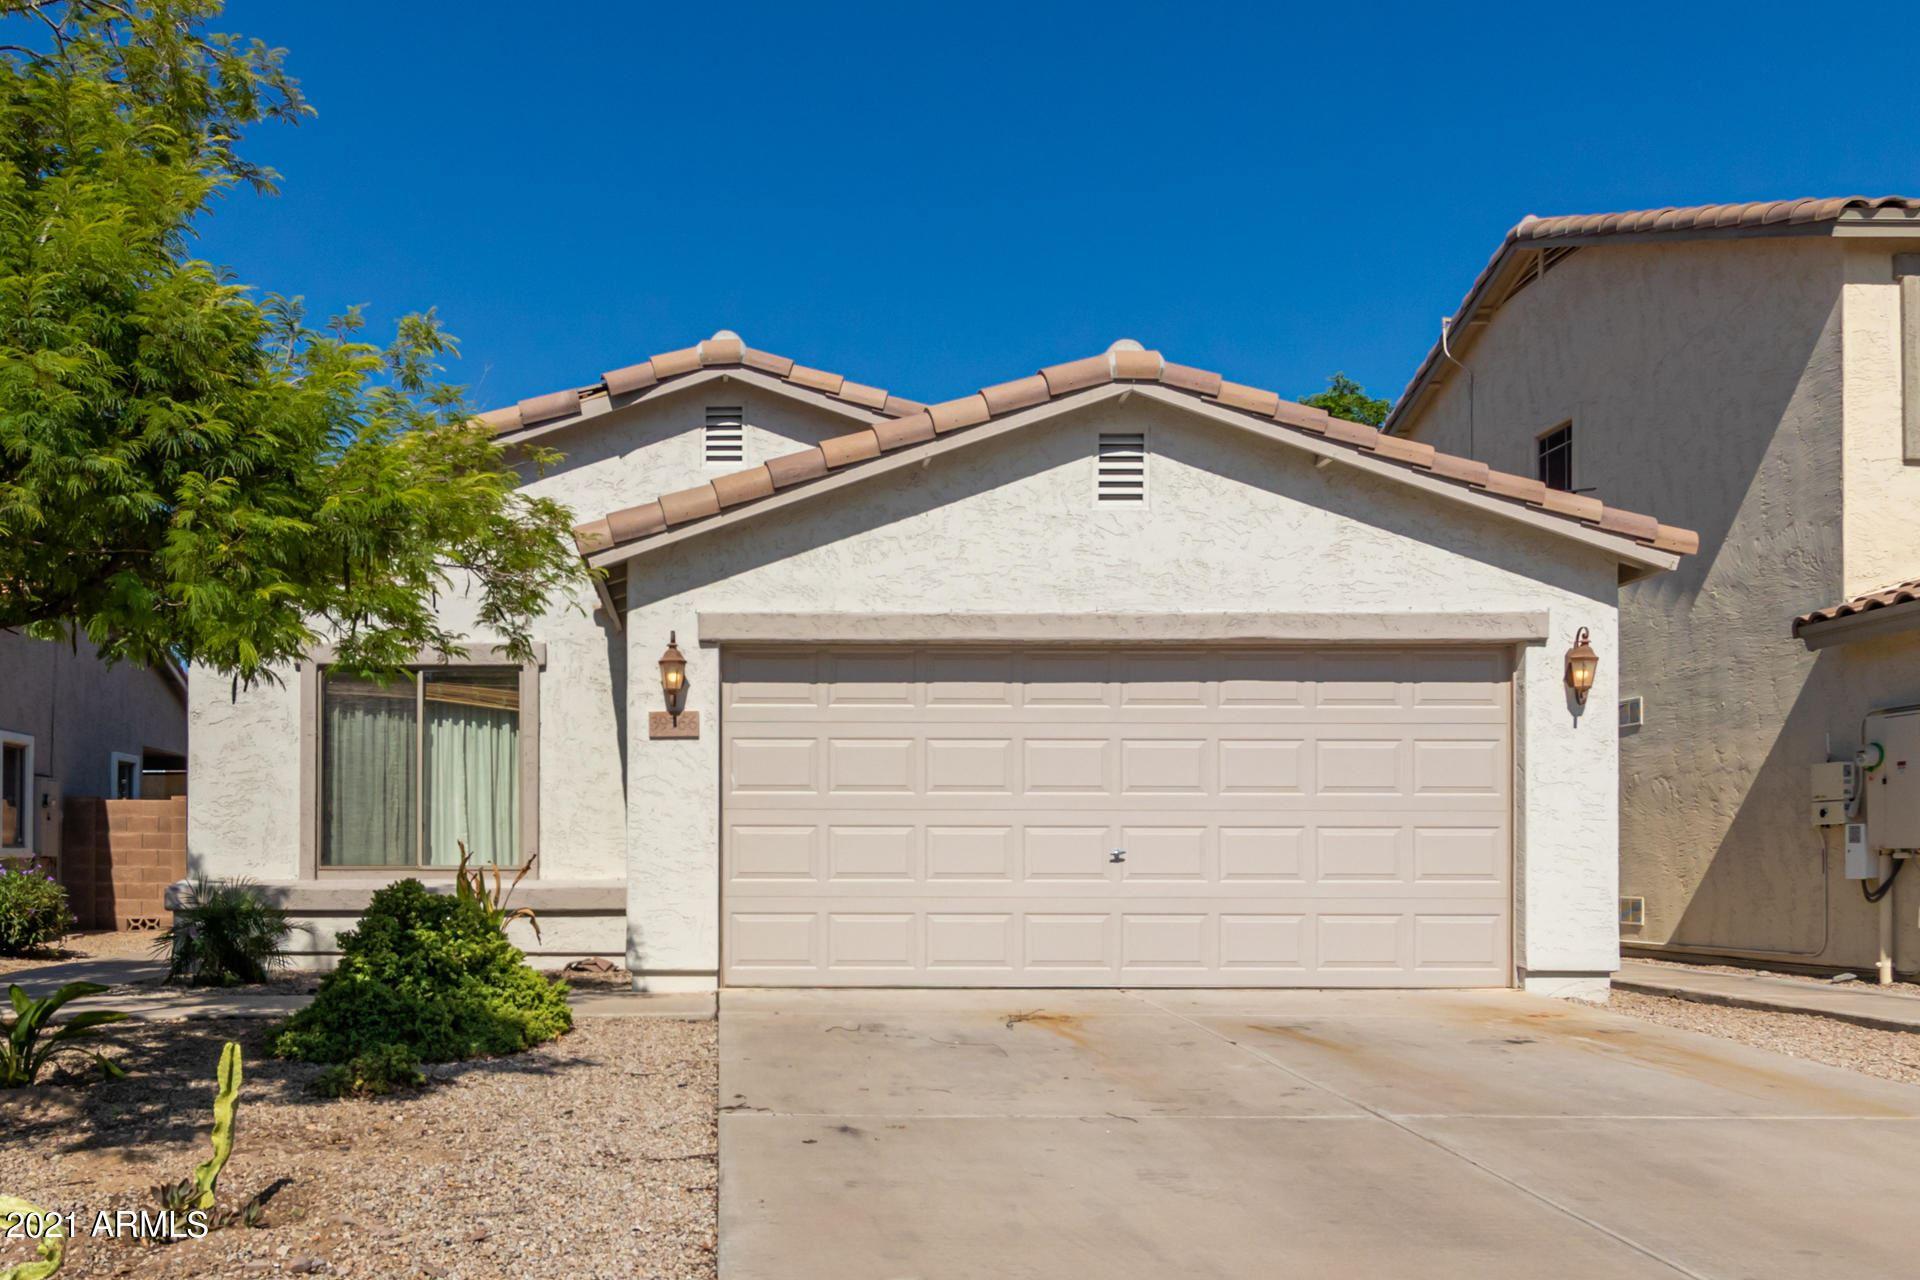 39566 N LAURA Avenue, San Tan Valley, AZ 85140 - MLS#: 6270811